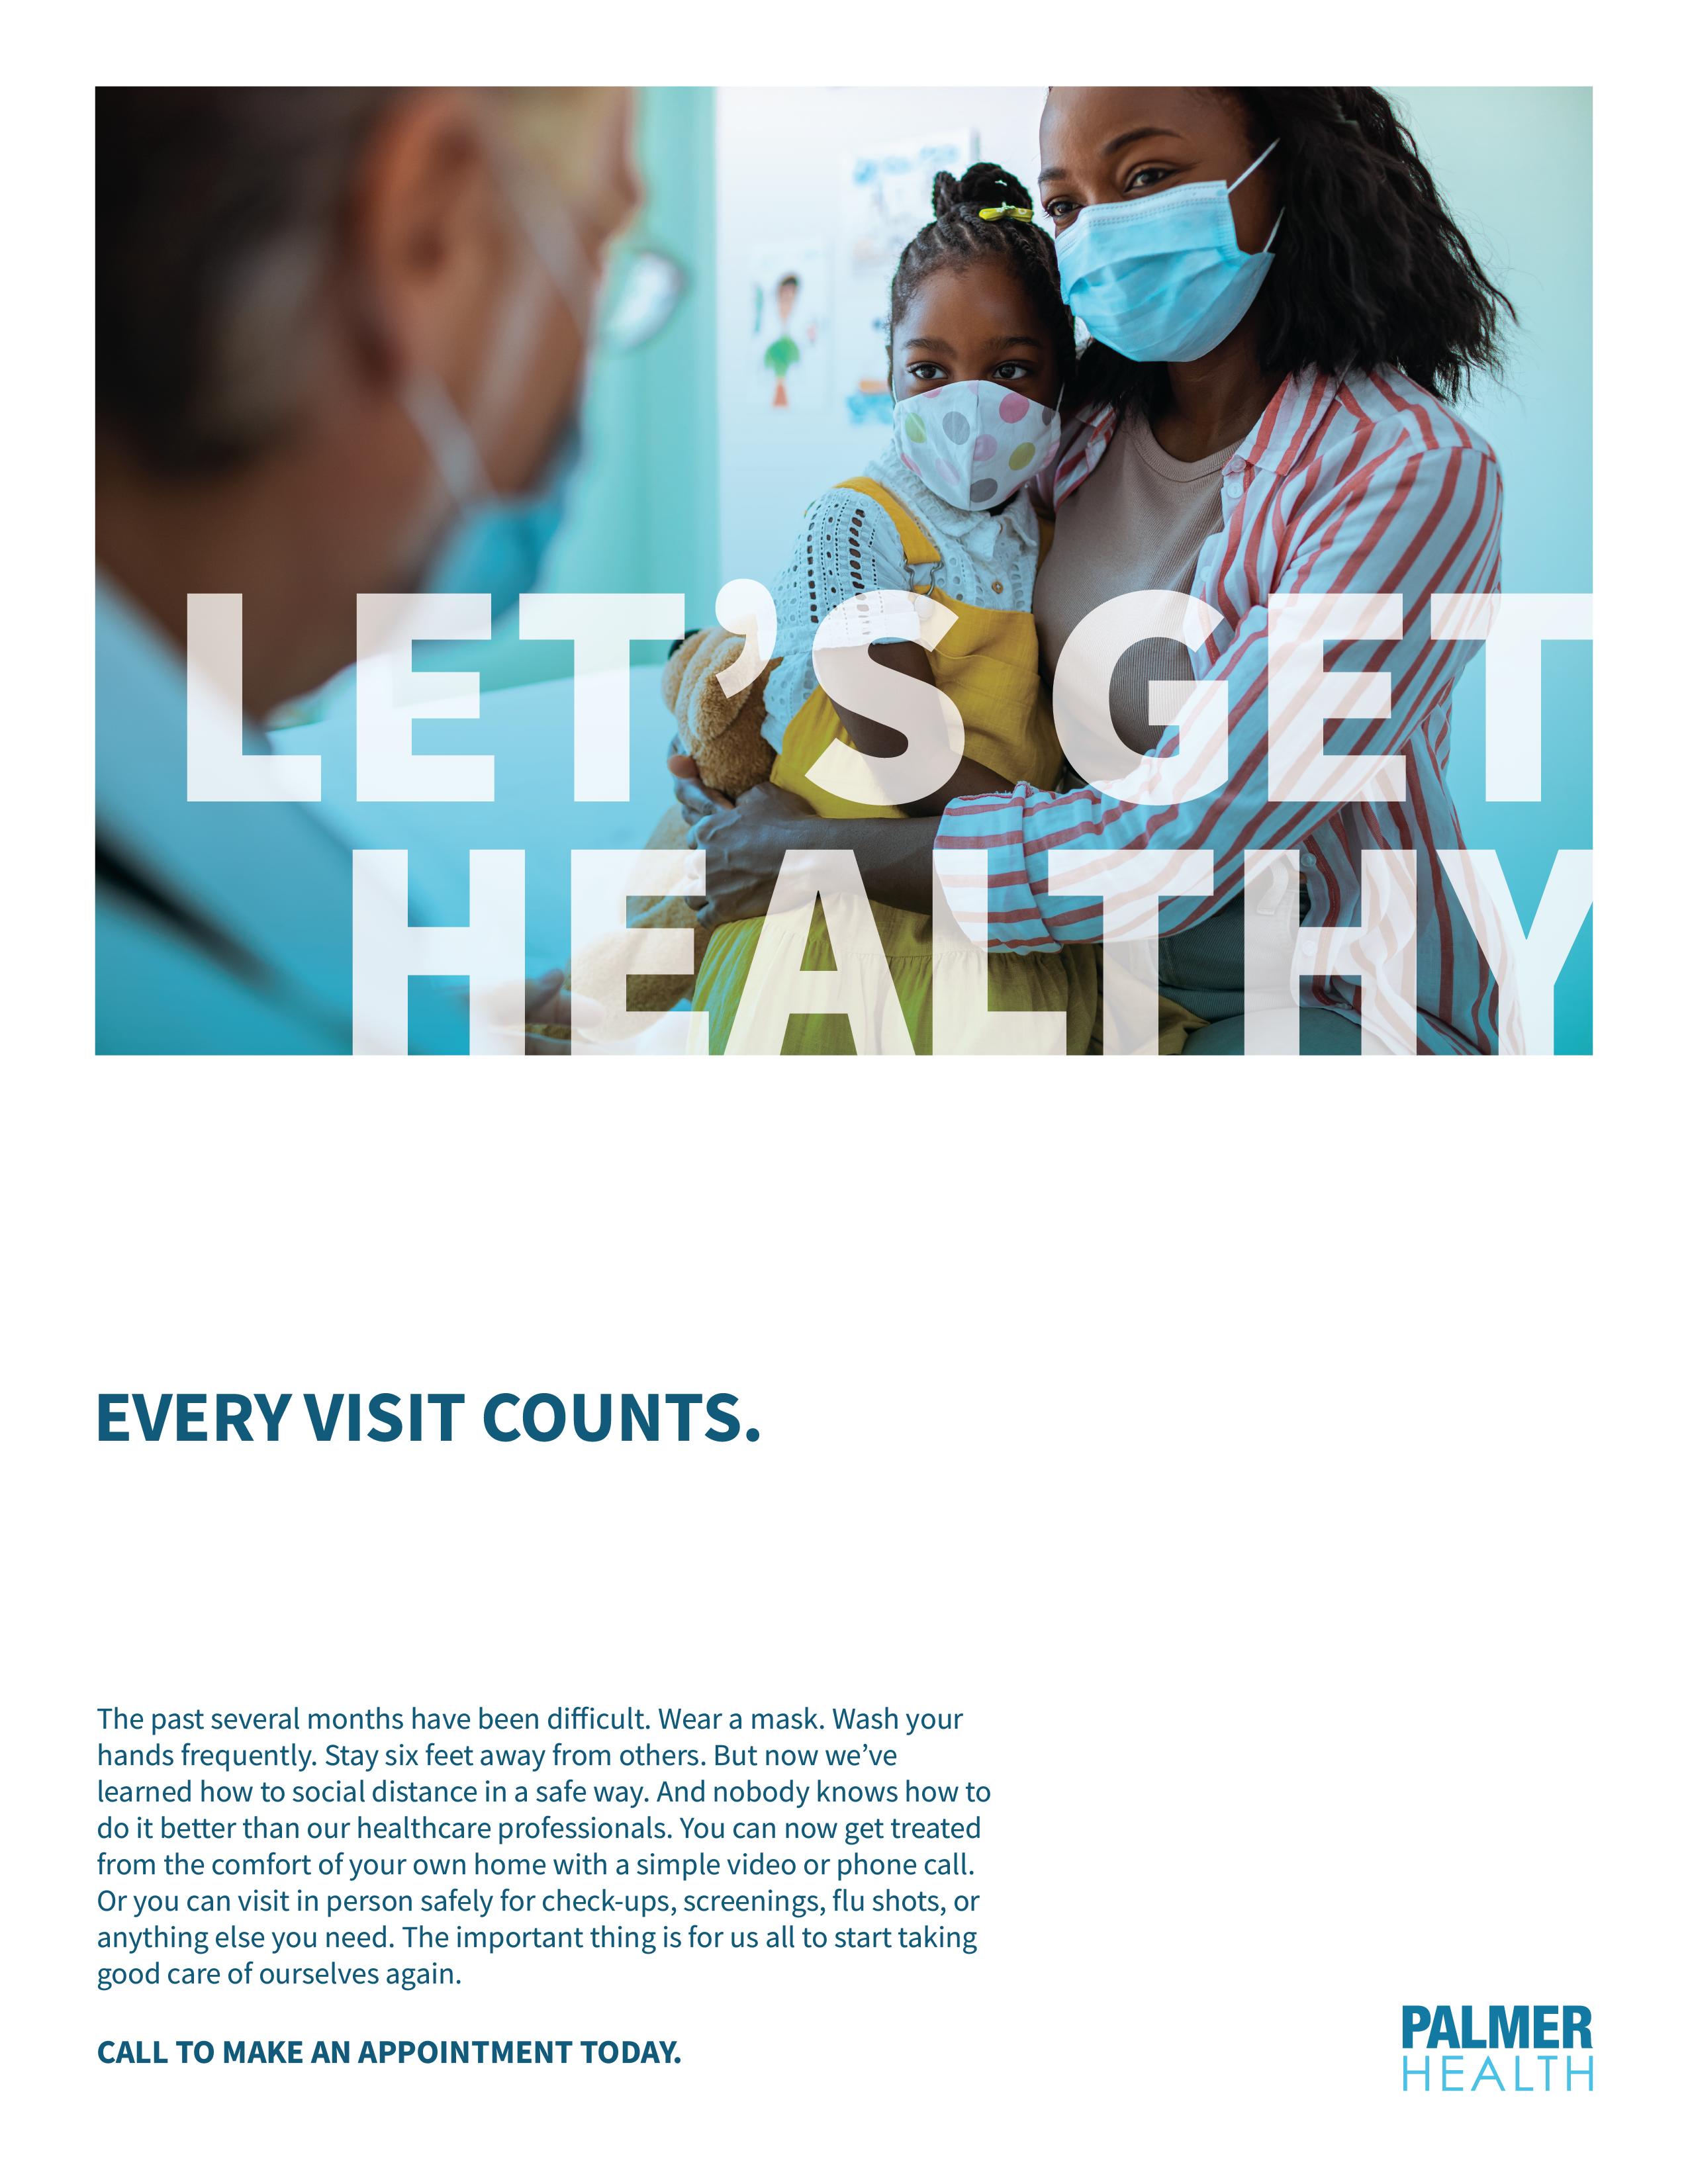 36152 Palmer health as dev for website-get healthy-v4-aug 20-03